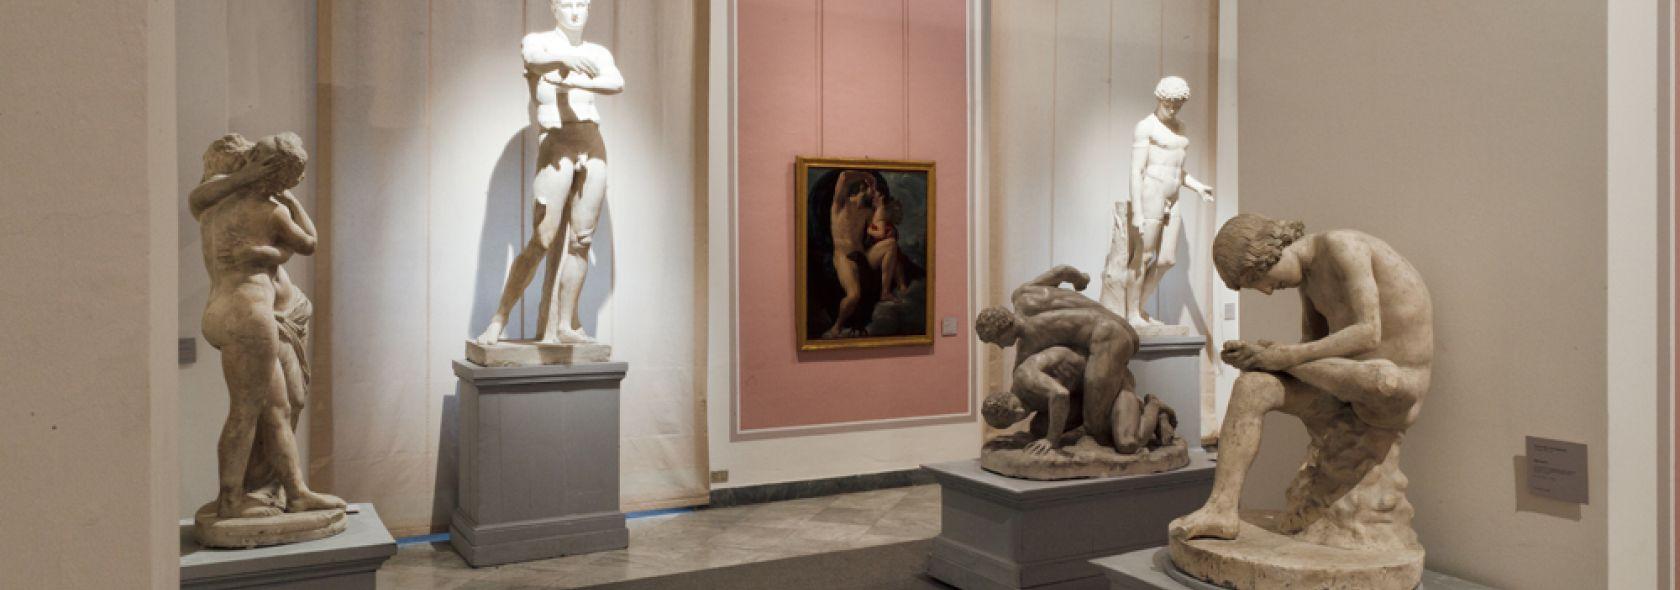 Accademia Ligustica - rievocazione Sala dei Gessi ottocentesca - foto © fManias